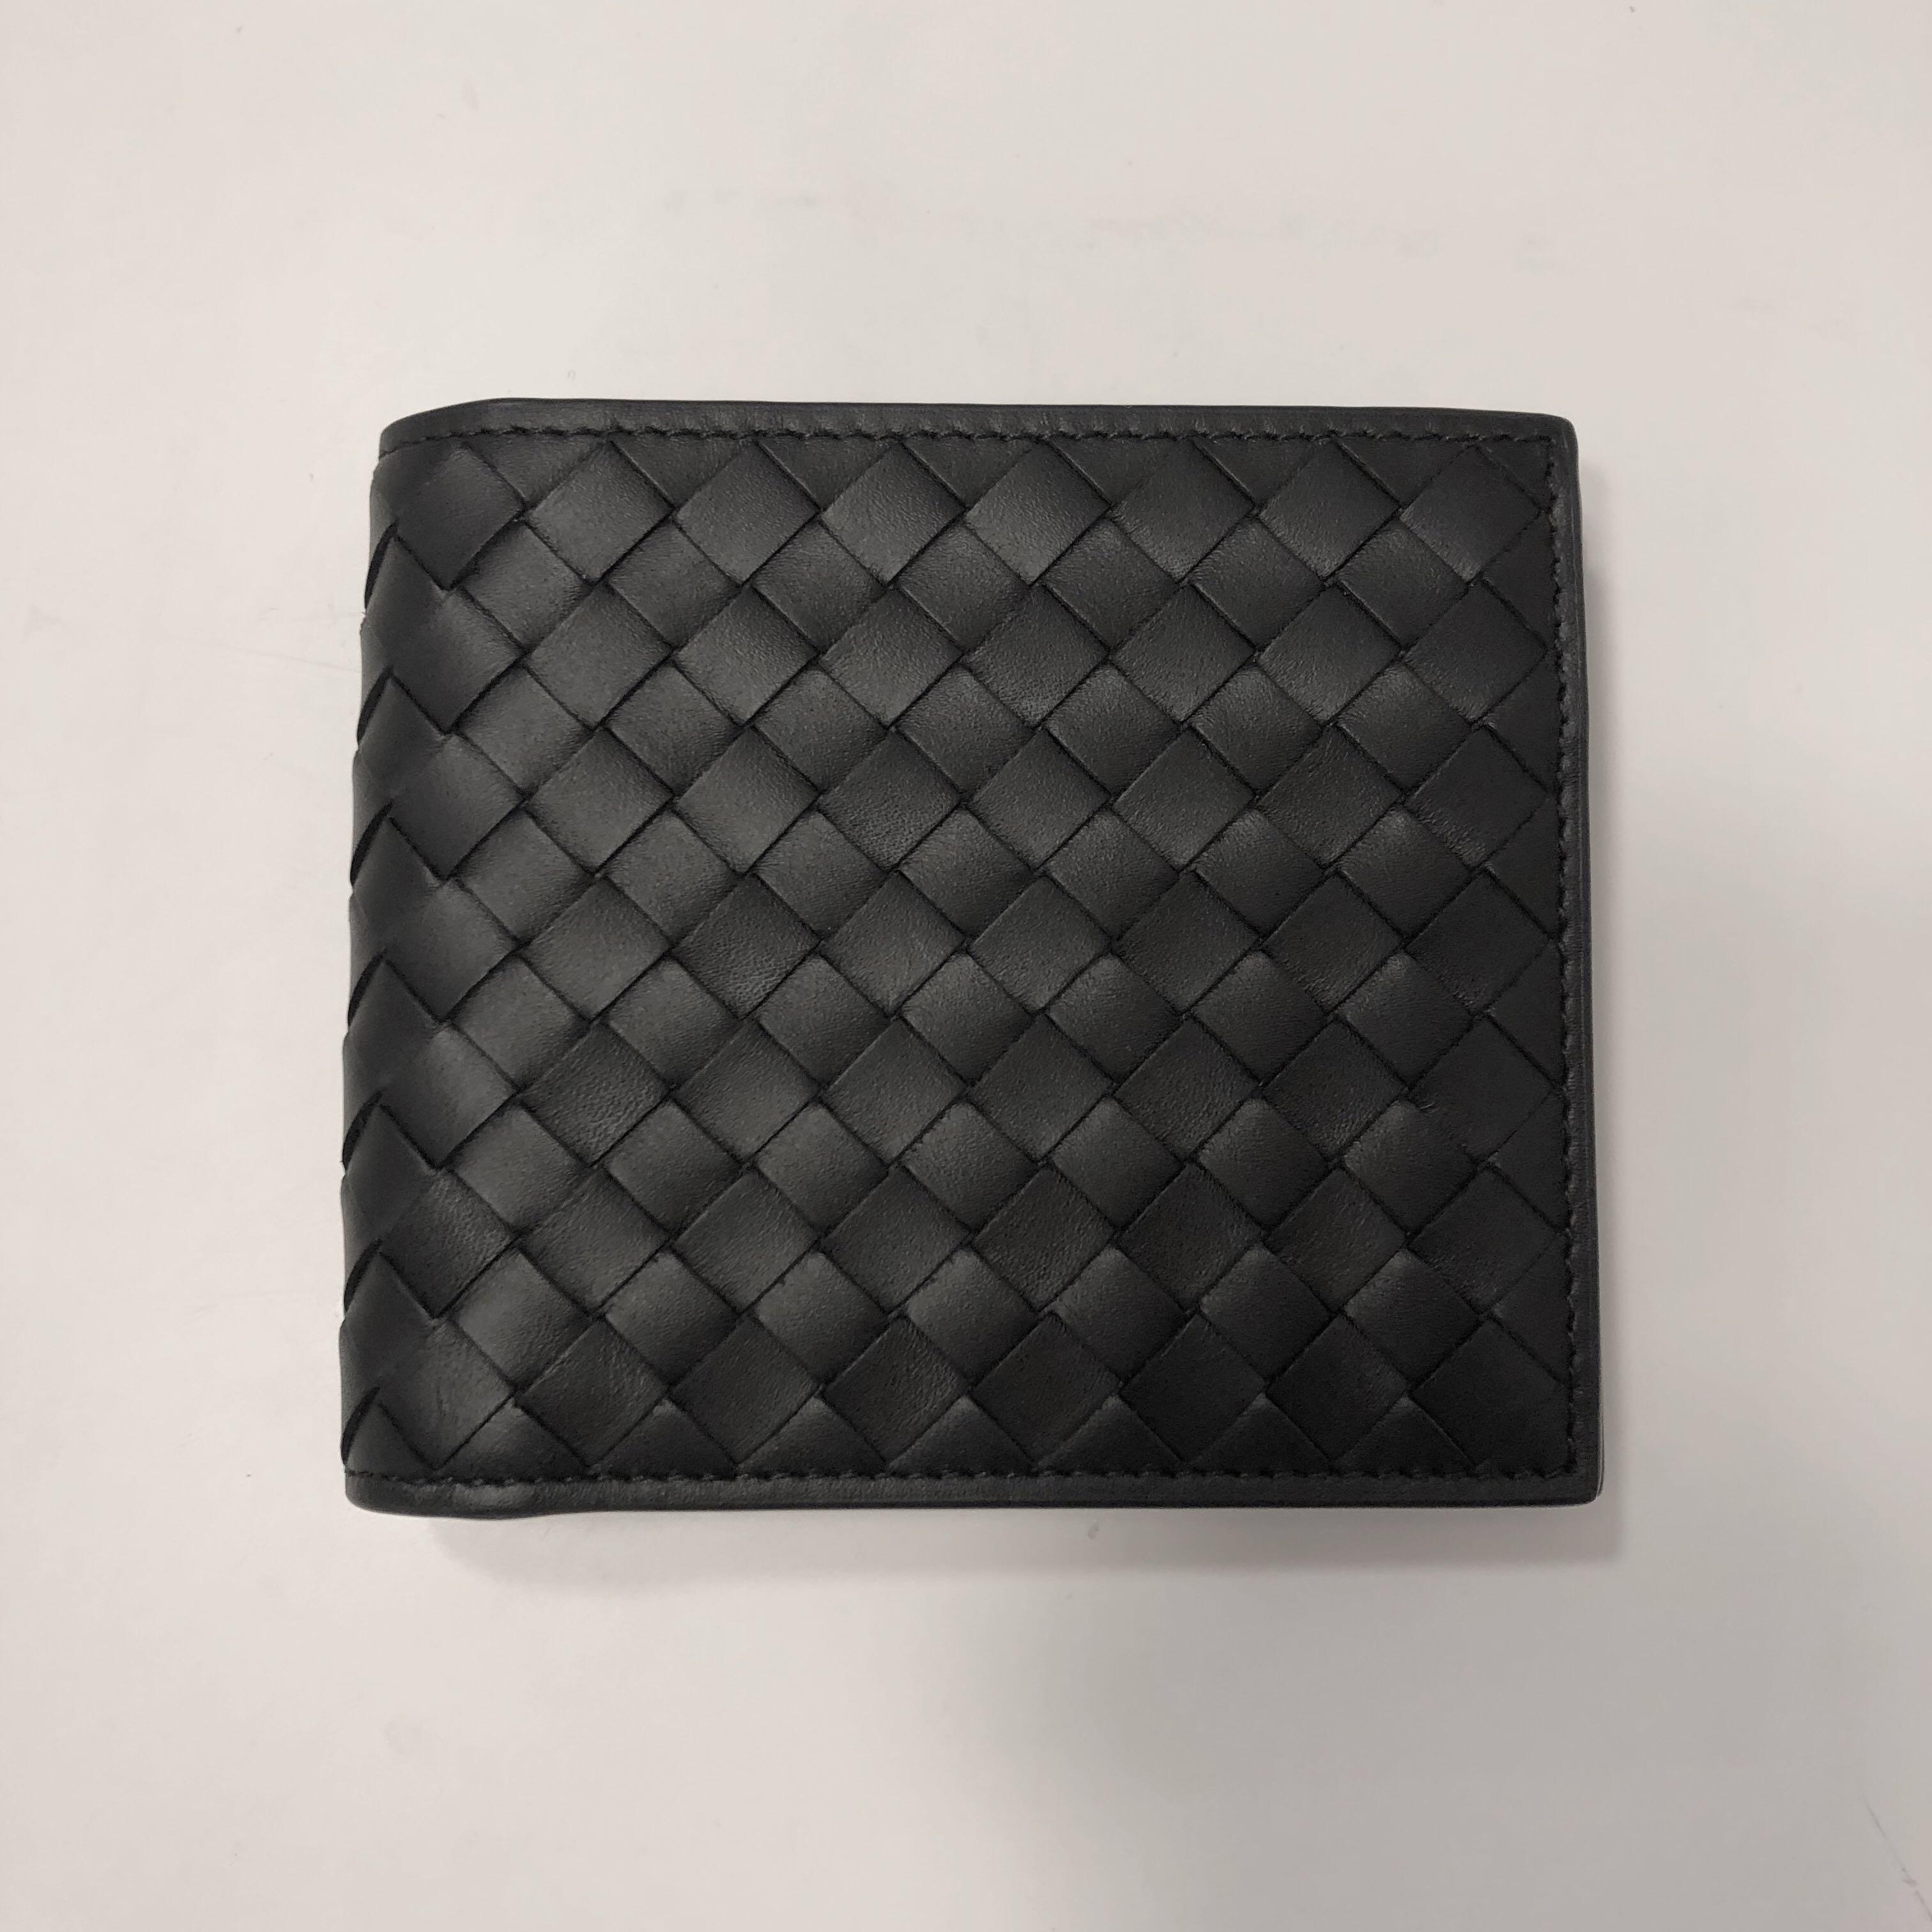 8056ec9dad53 Bottega Veneta Bi-Fold Wallet with Coin Purse